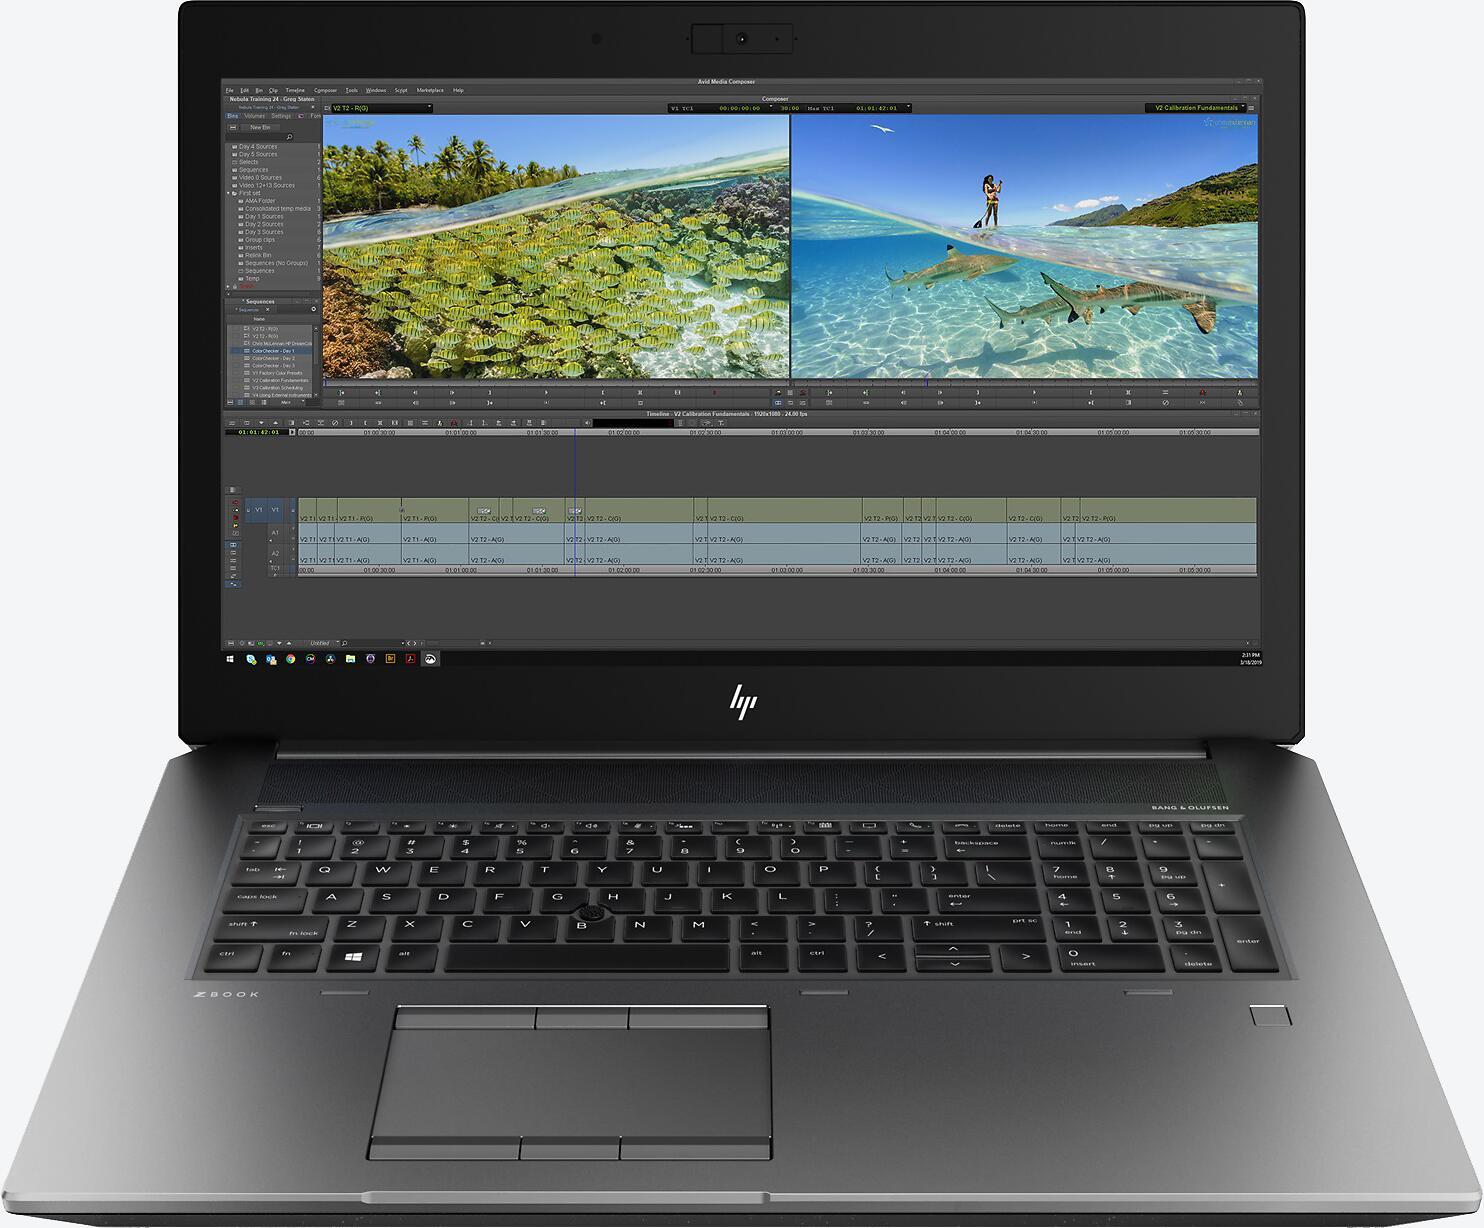 HP ZBook 17 G6 Grau (8JM11EA)